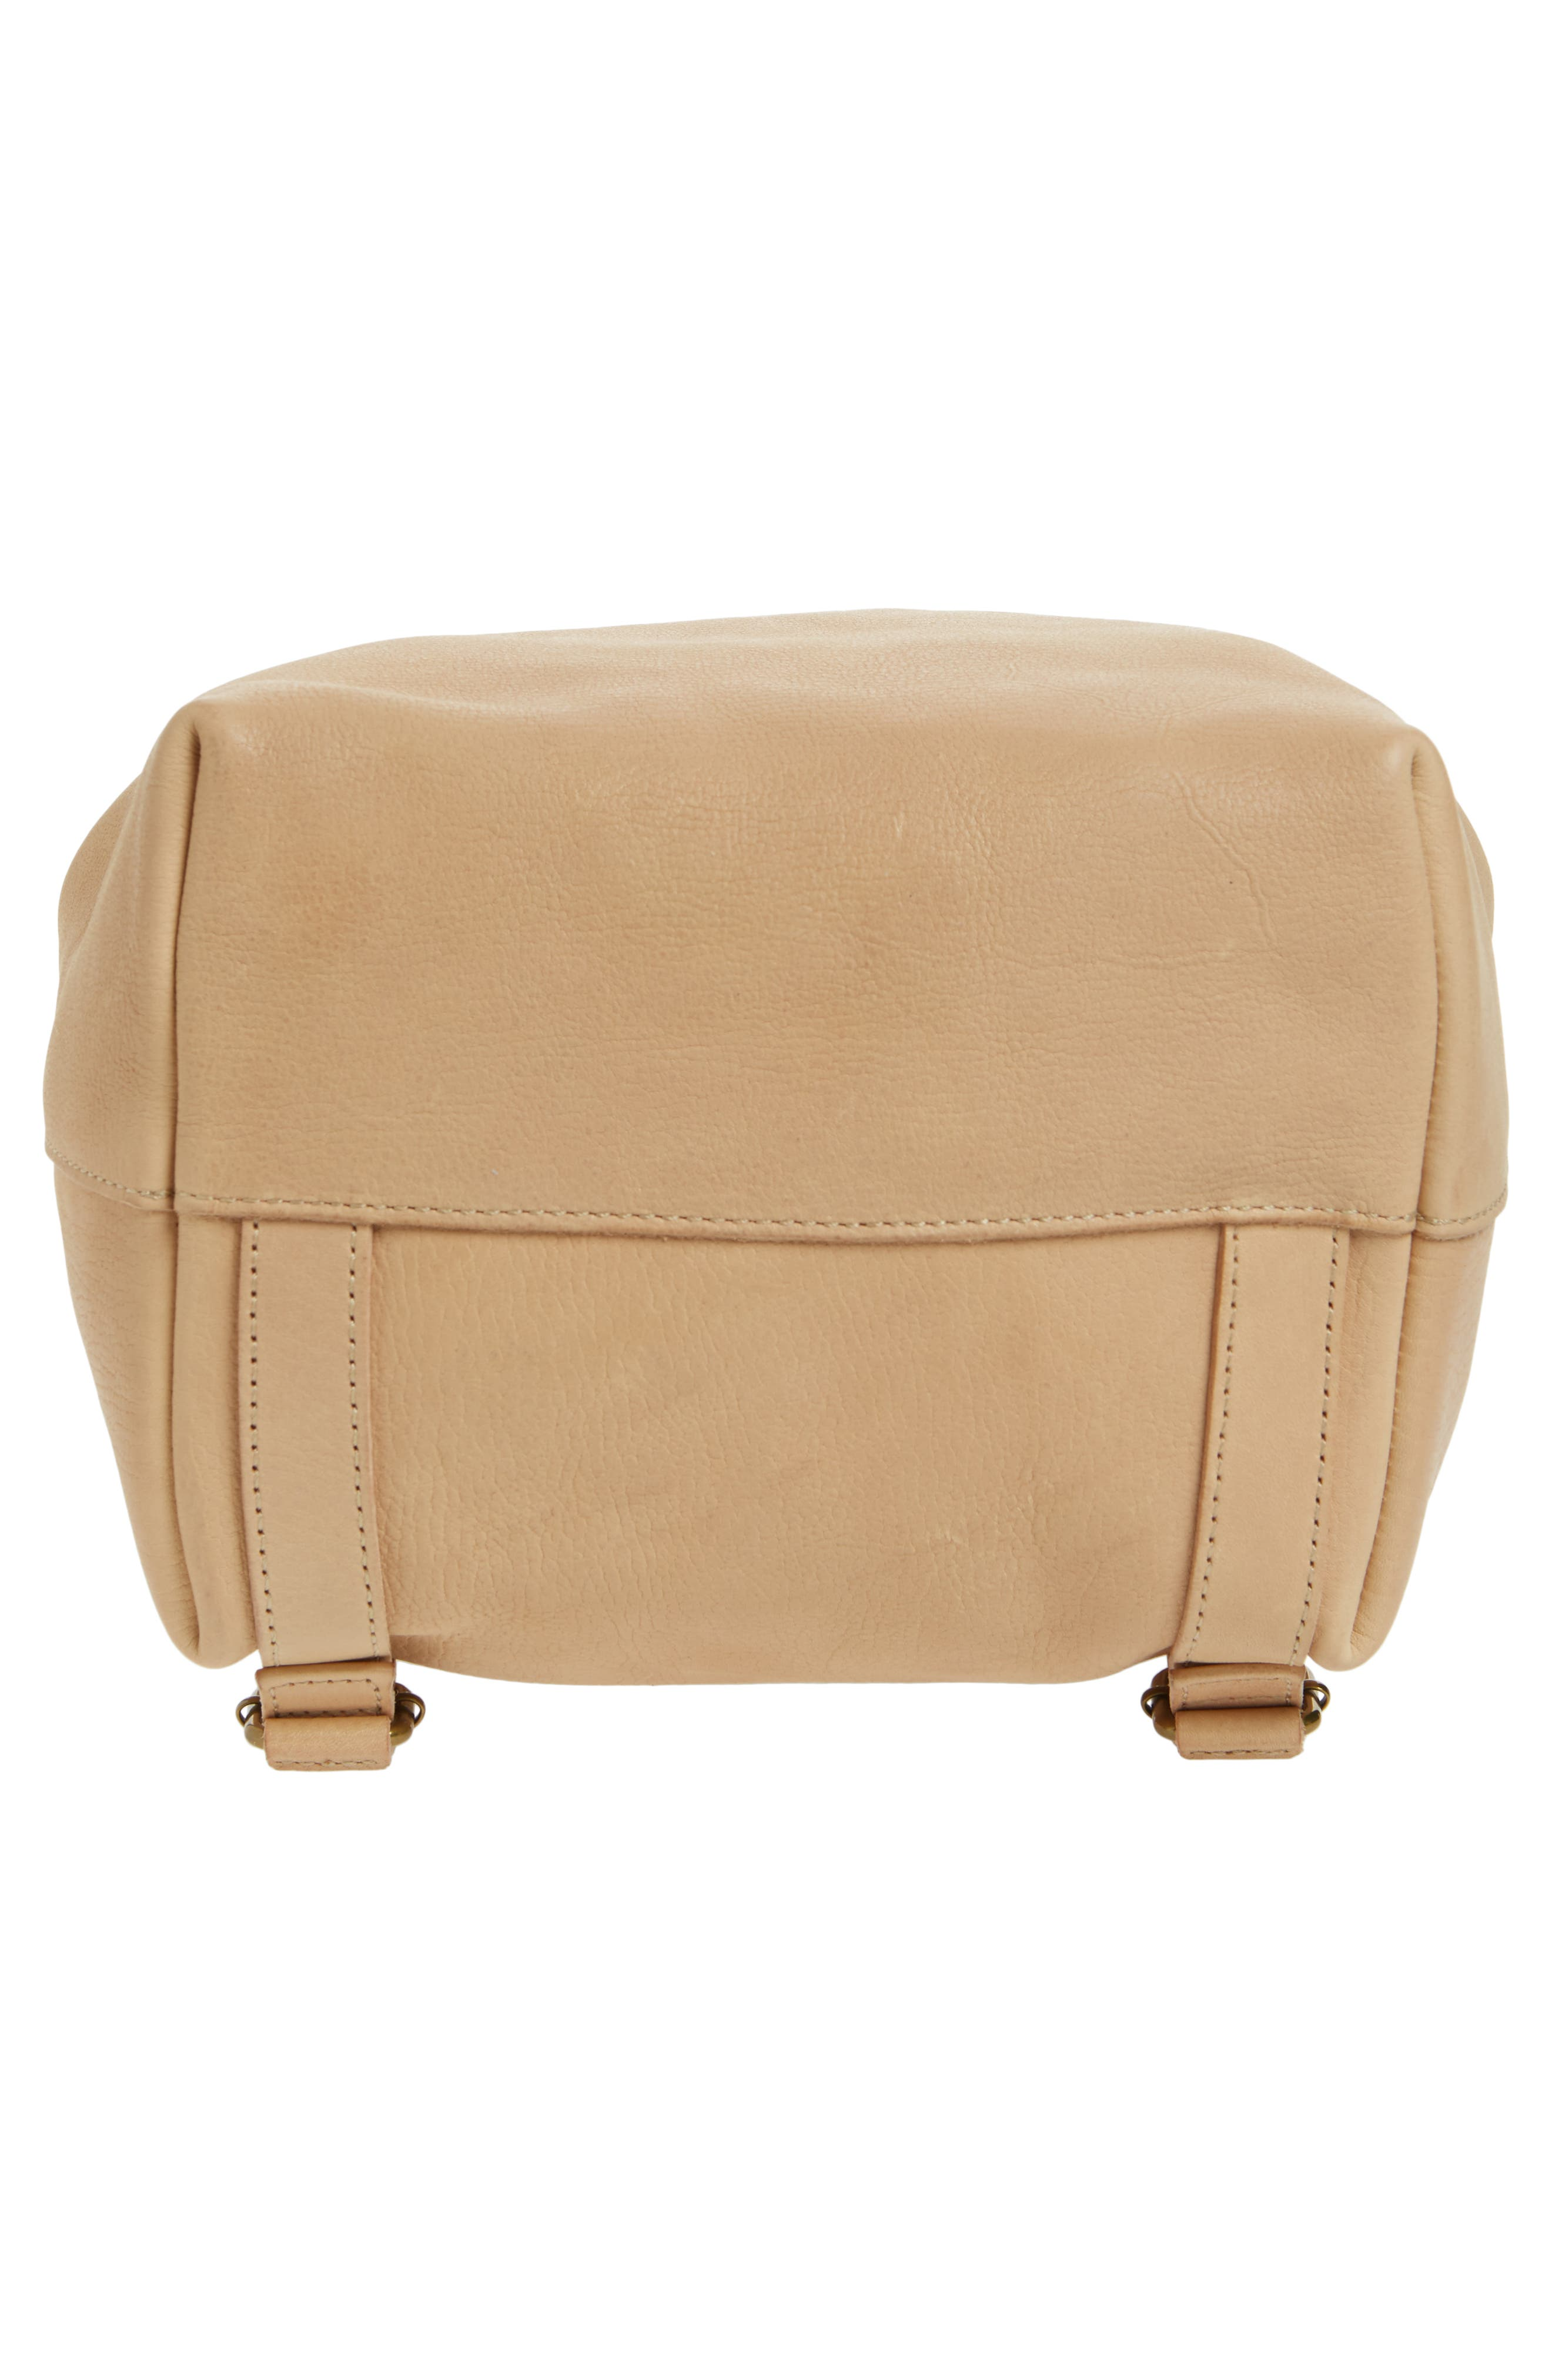 Somerset Leather Backpack,                             Alternate thumbnail 6, color,                             LINEN